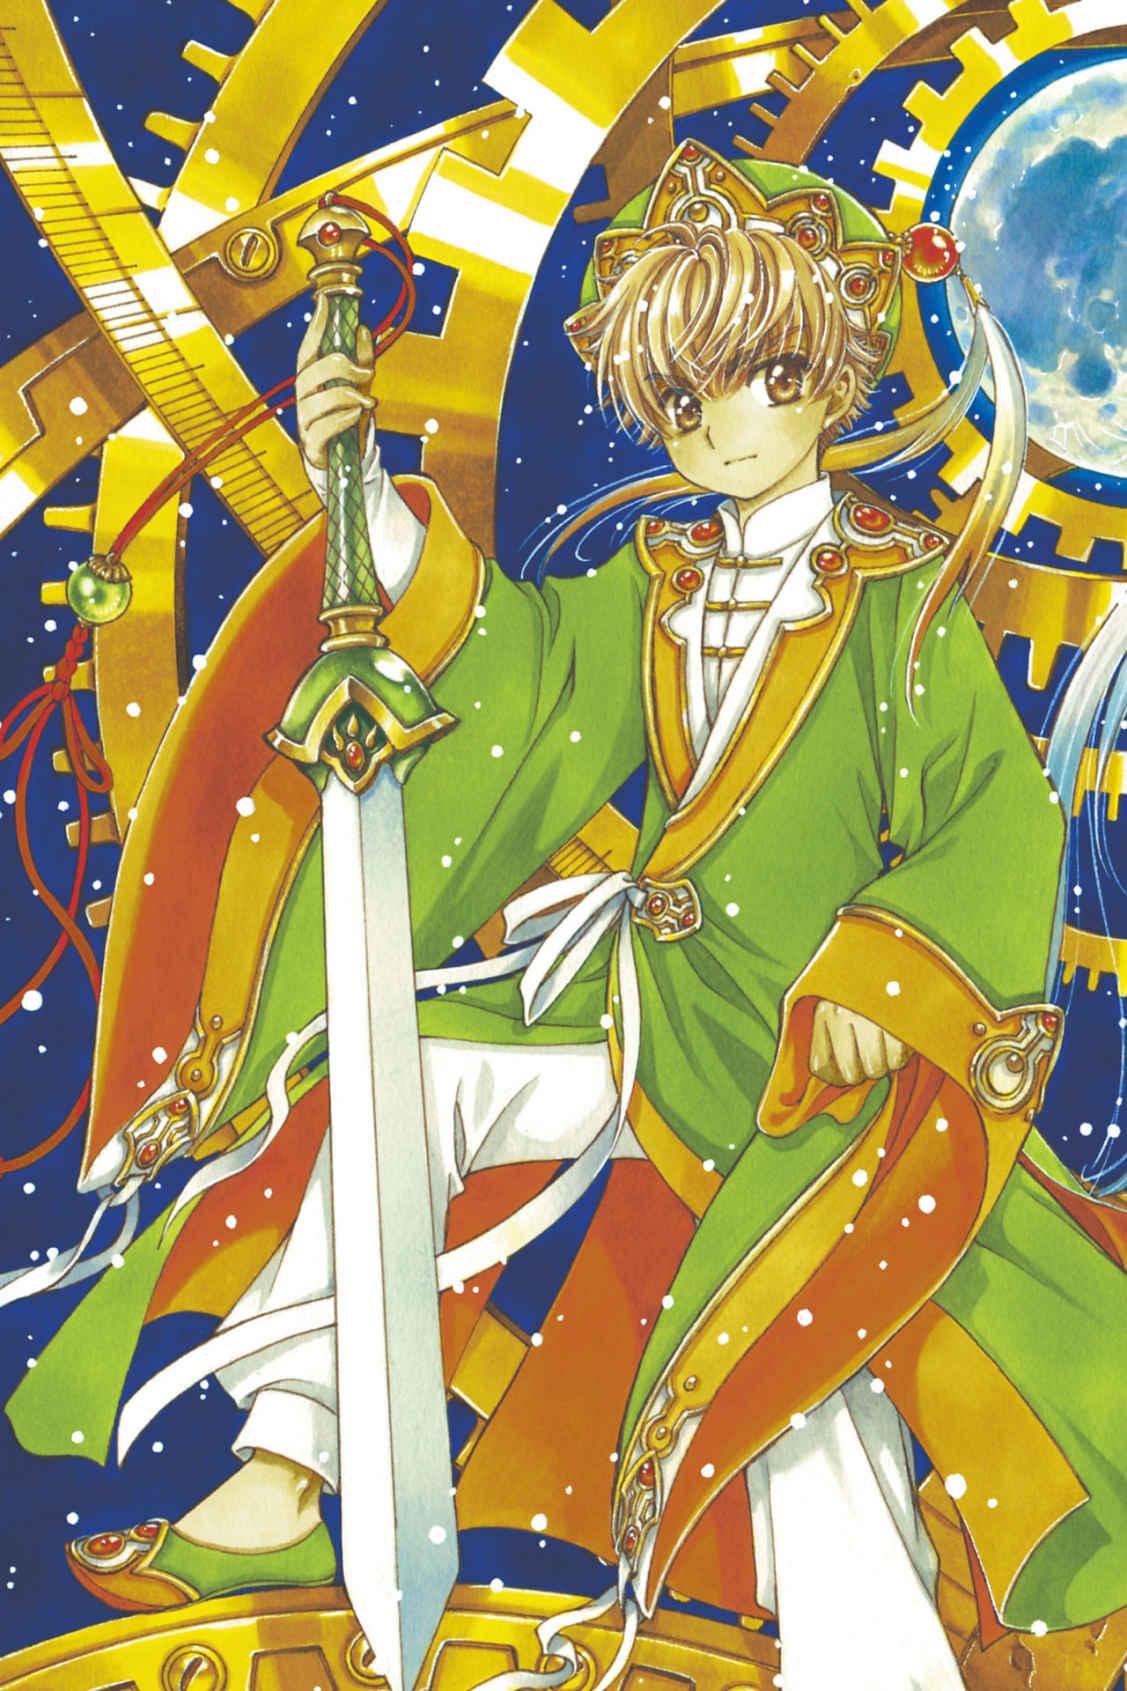 Card Captor Sakura et autres mangas [CLAMP] - Page 39 Cardca11